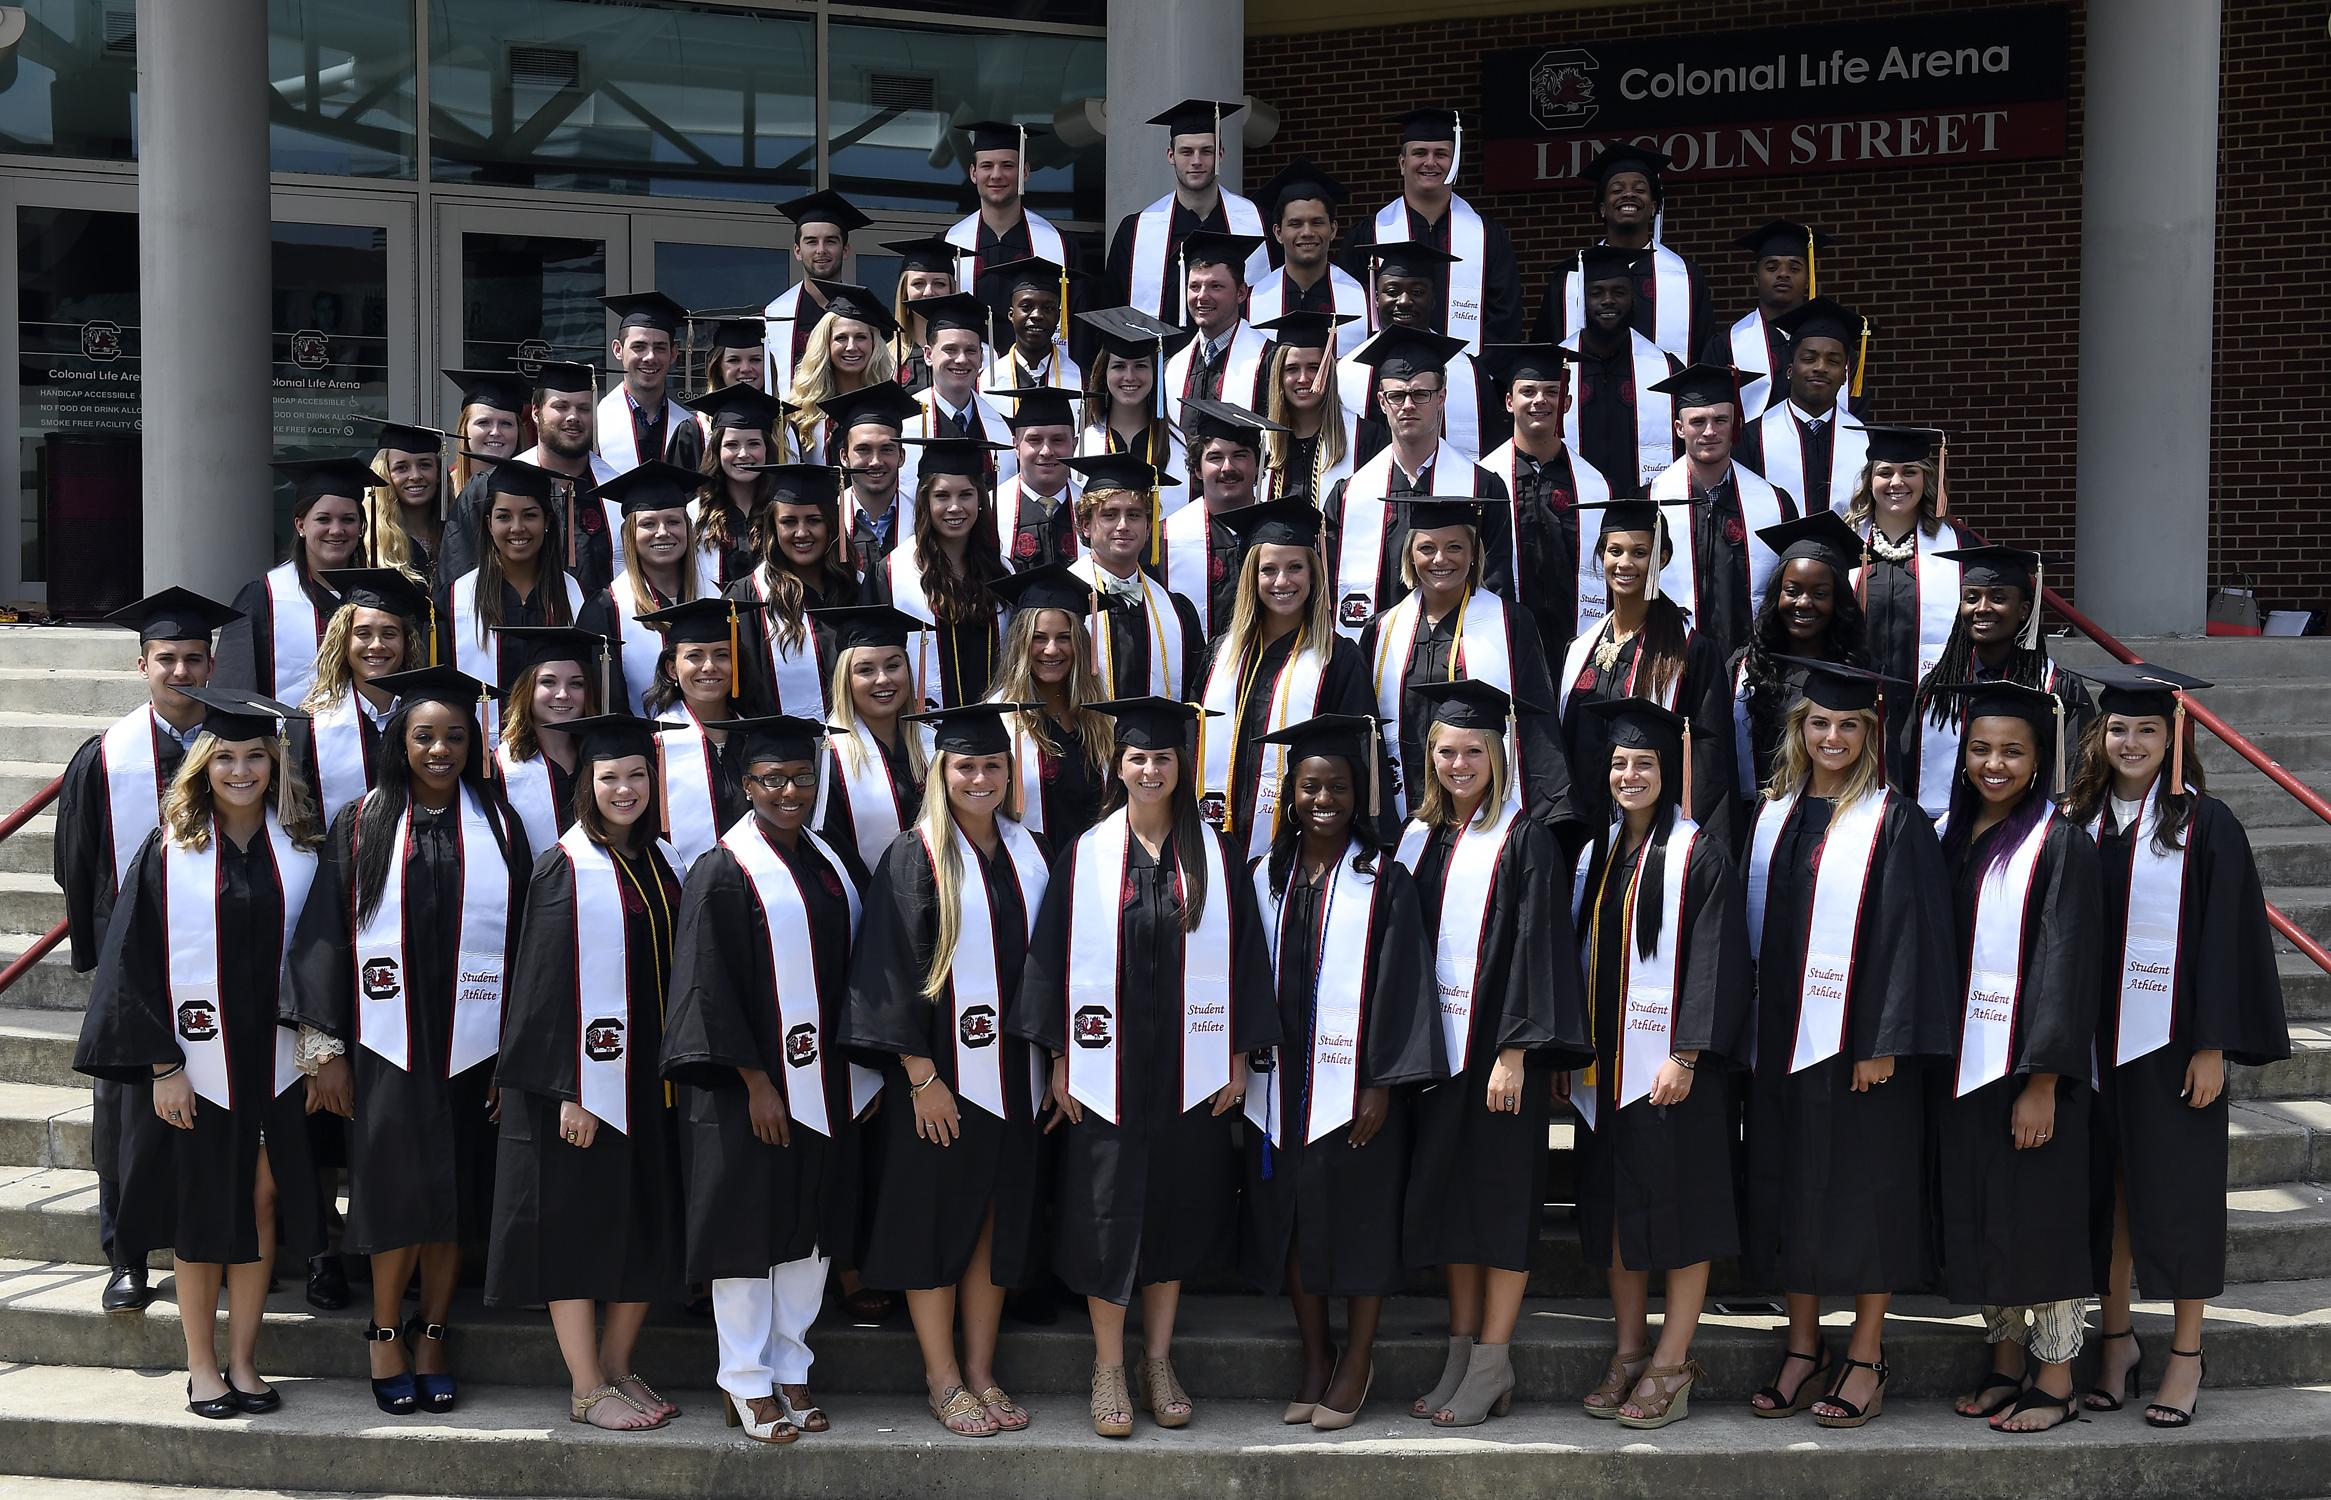 Usc Columbia Graduation Ring